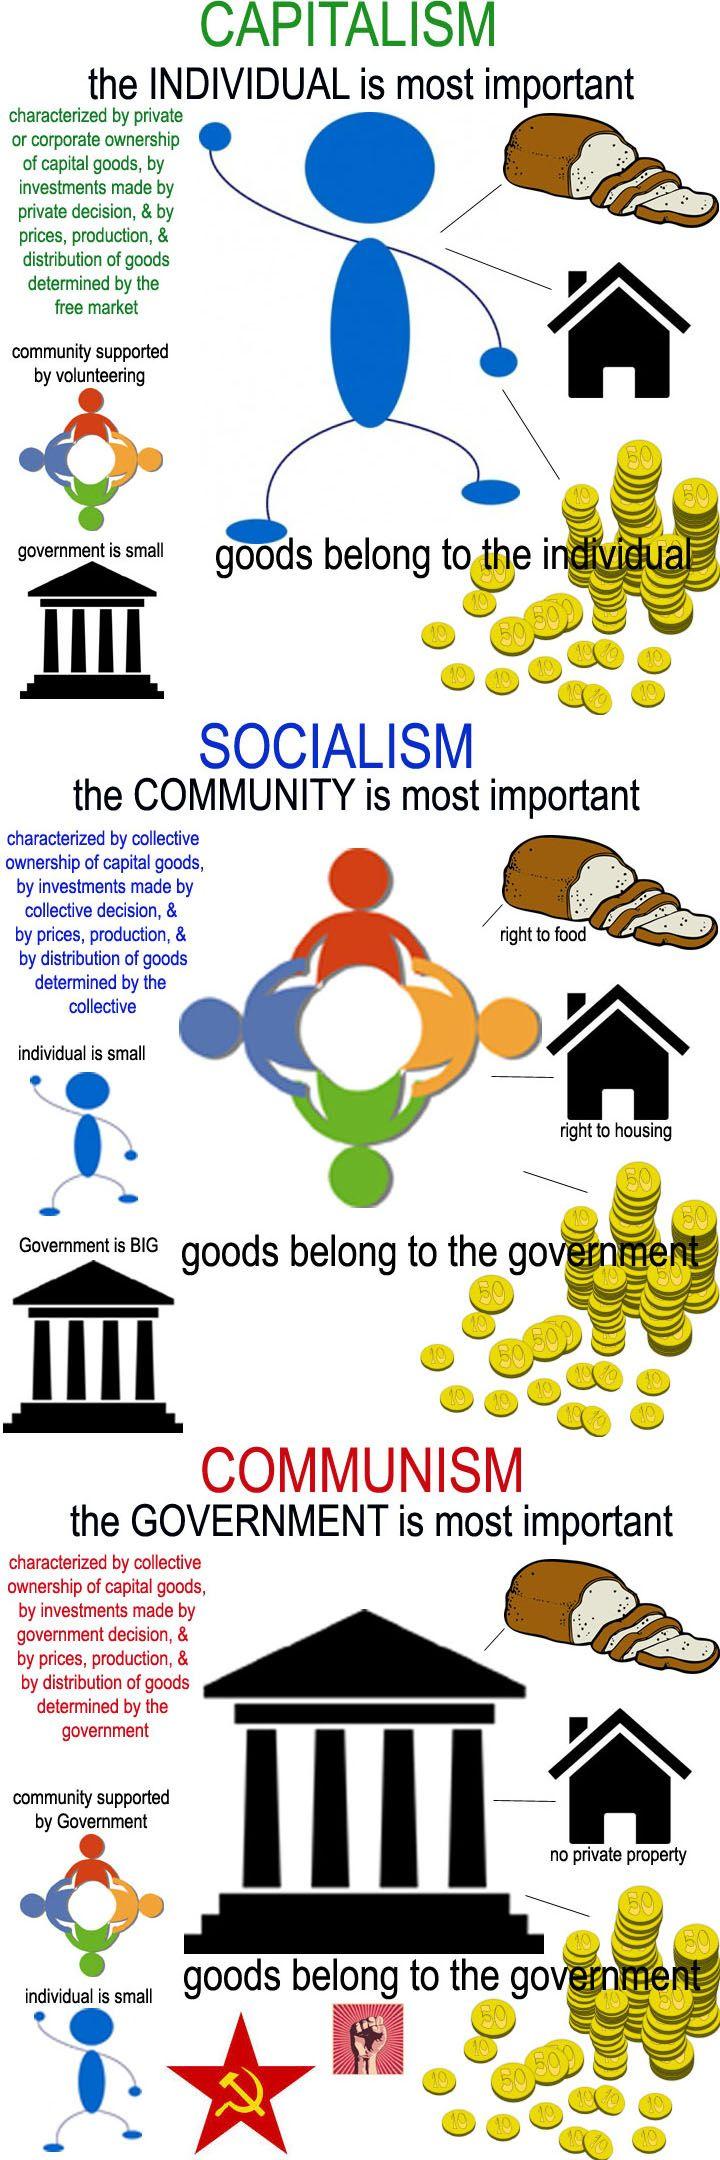 Free Capitalism Cliparts, Download Free Clip Art, Free Clip.